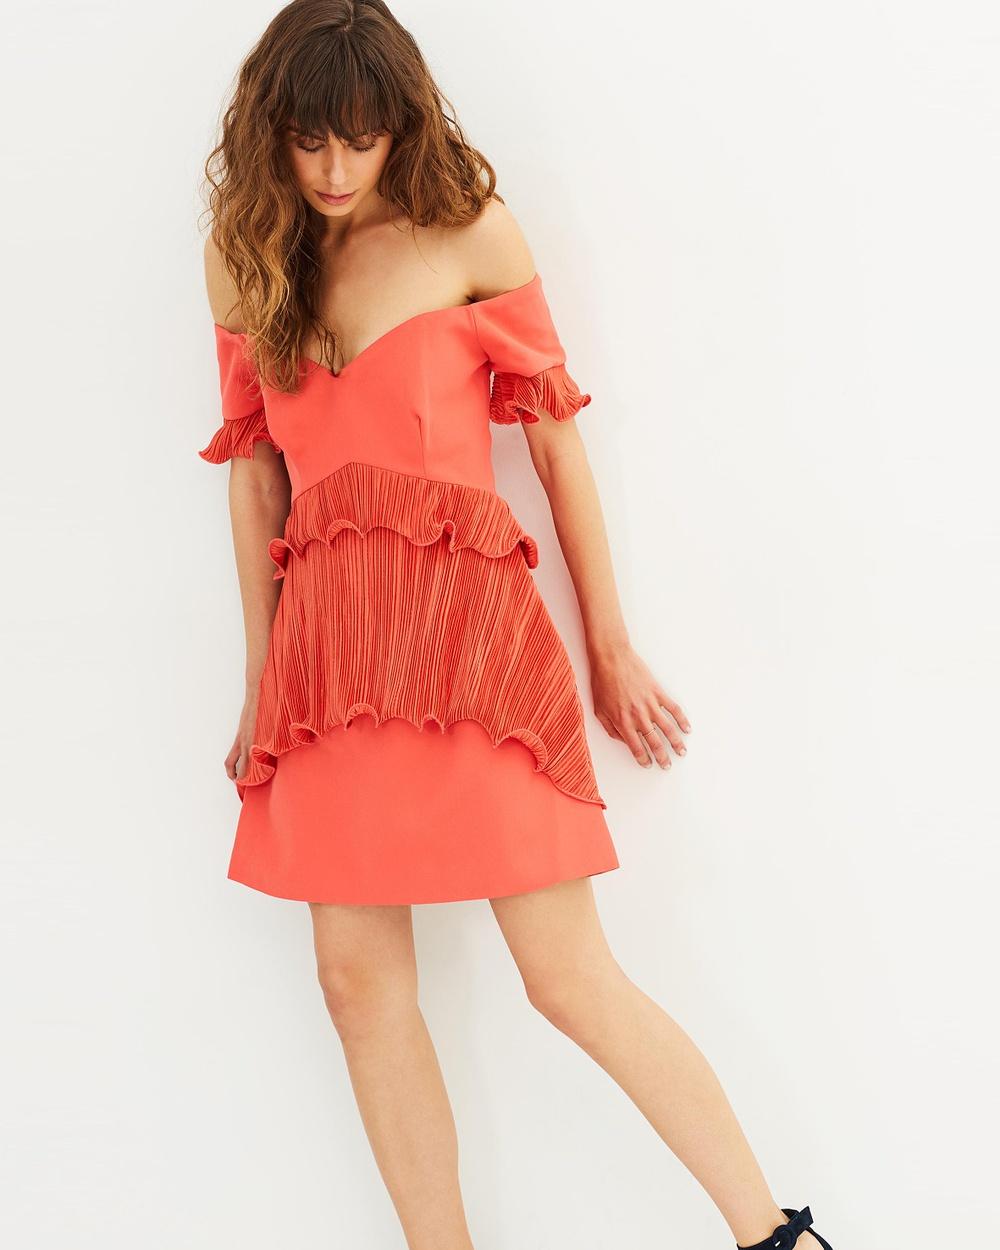 Talulah Grande Off Shoulder Mini Dress Dresses Coral Grande Off-Shoulder Mini Dress